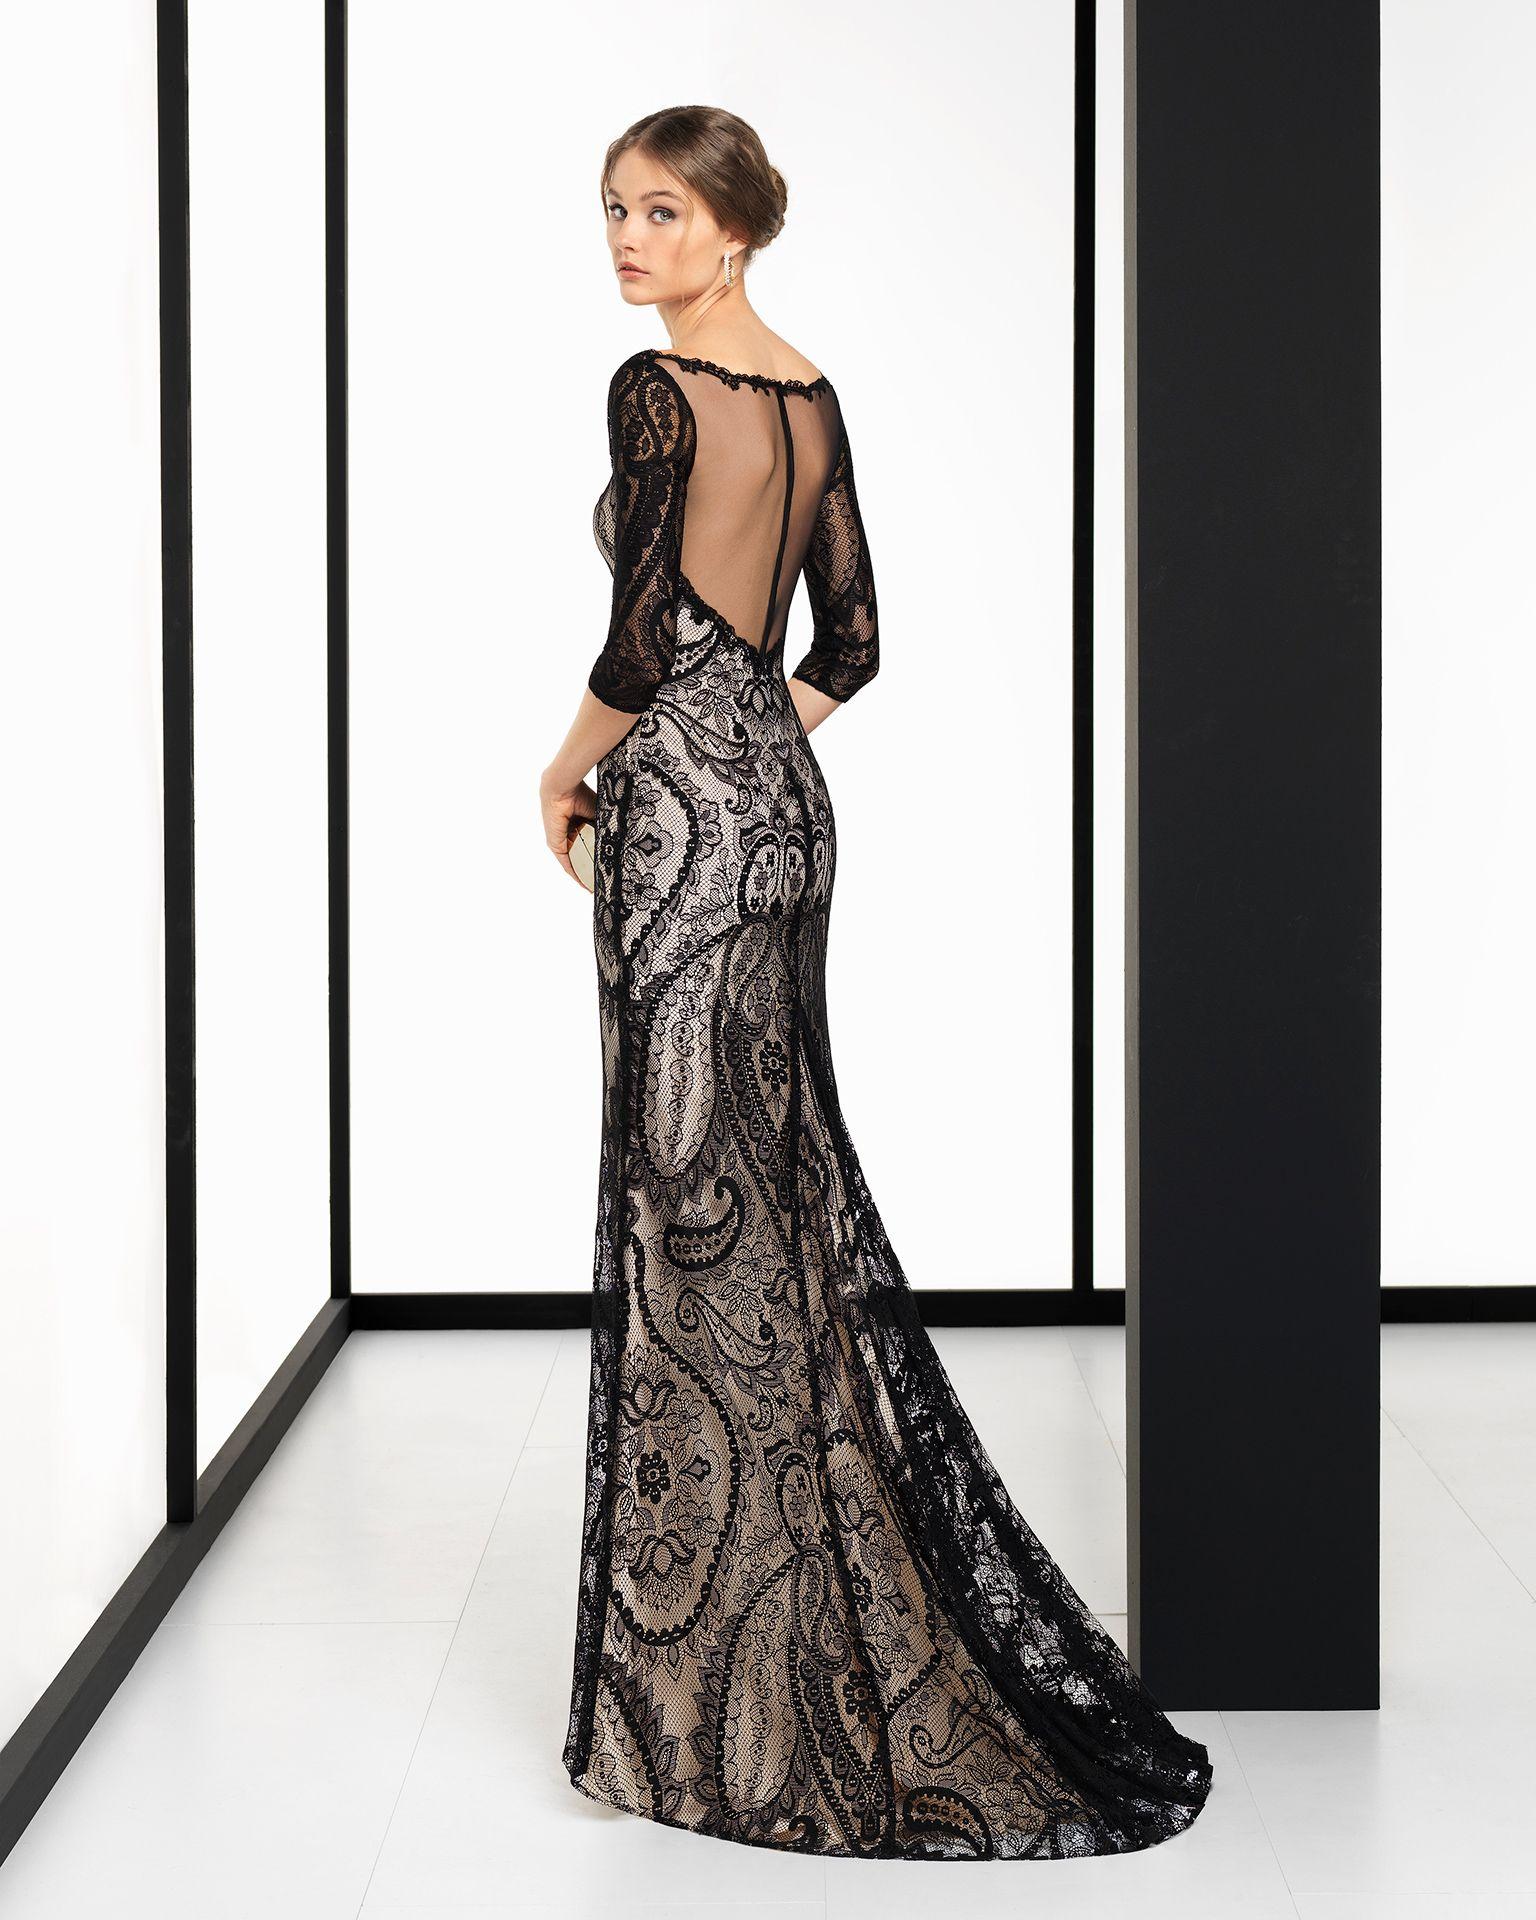 best website f4011 62644 2T1C1 - Cocktail 2018. Collezione ROSA CLARA COCKTAIL ...